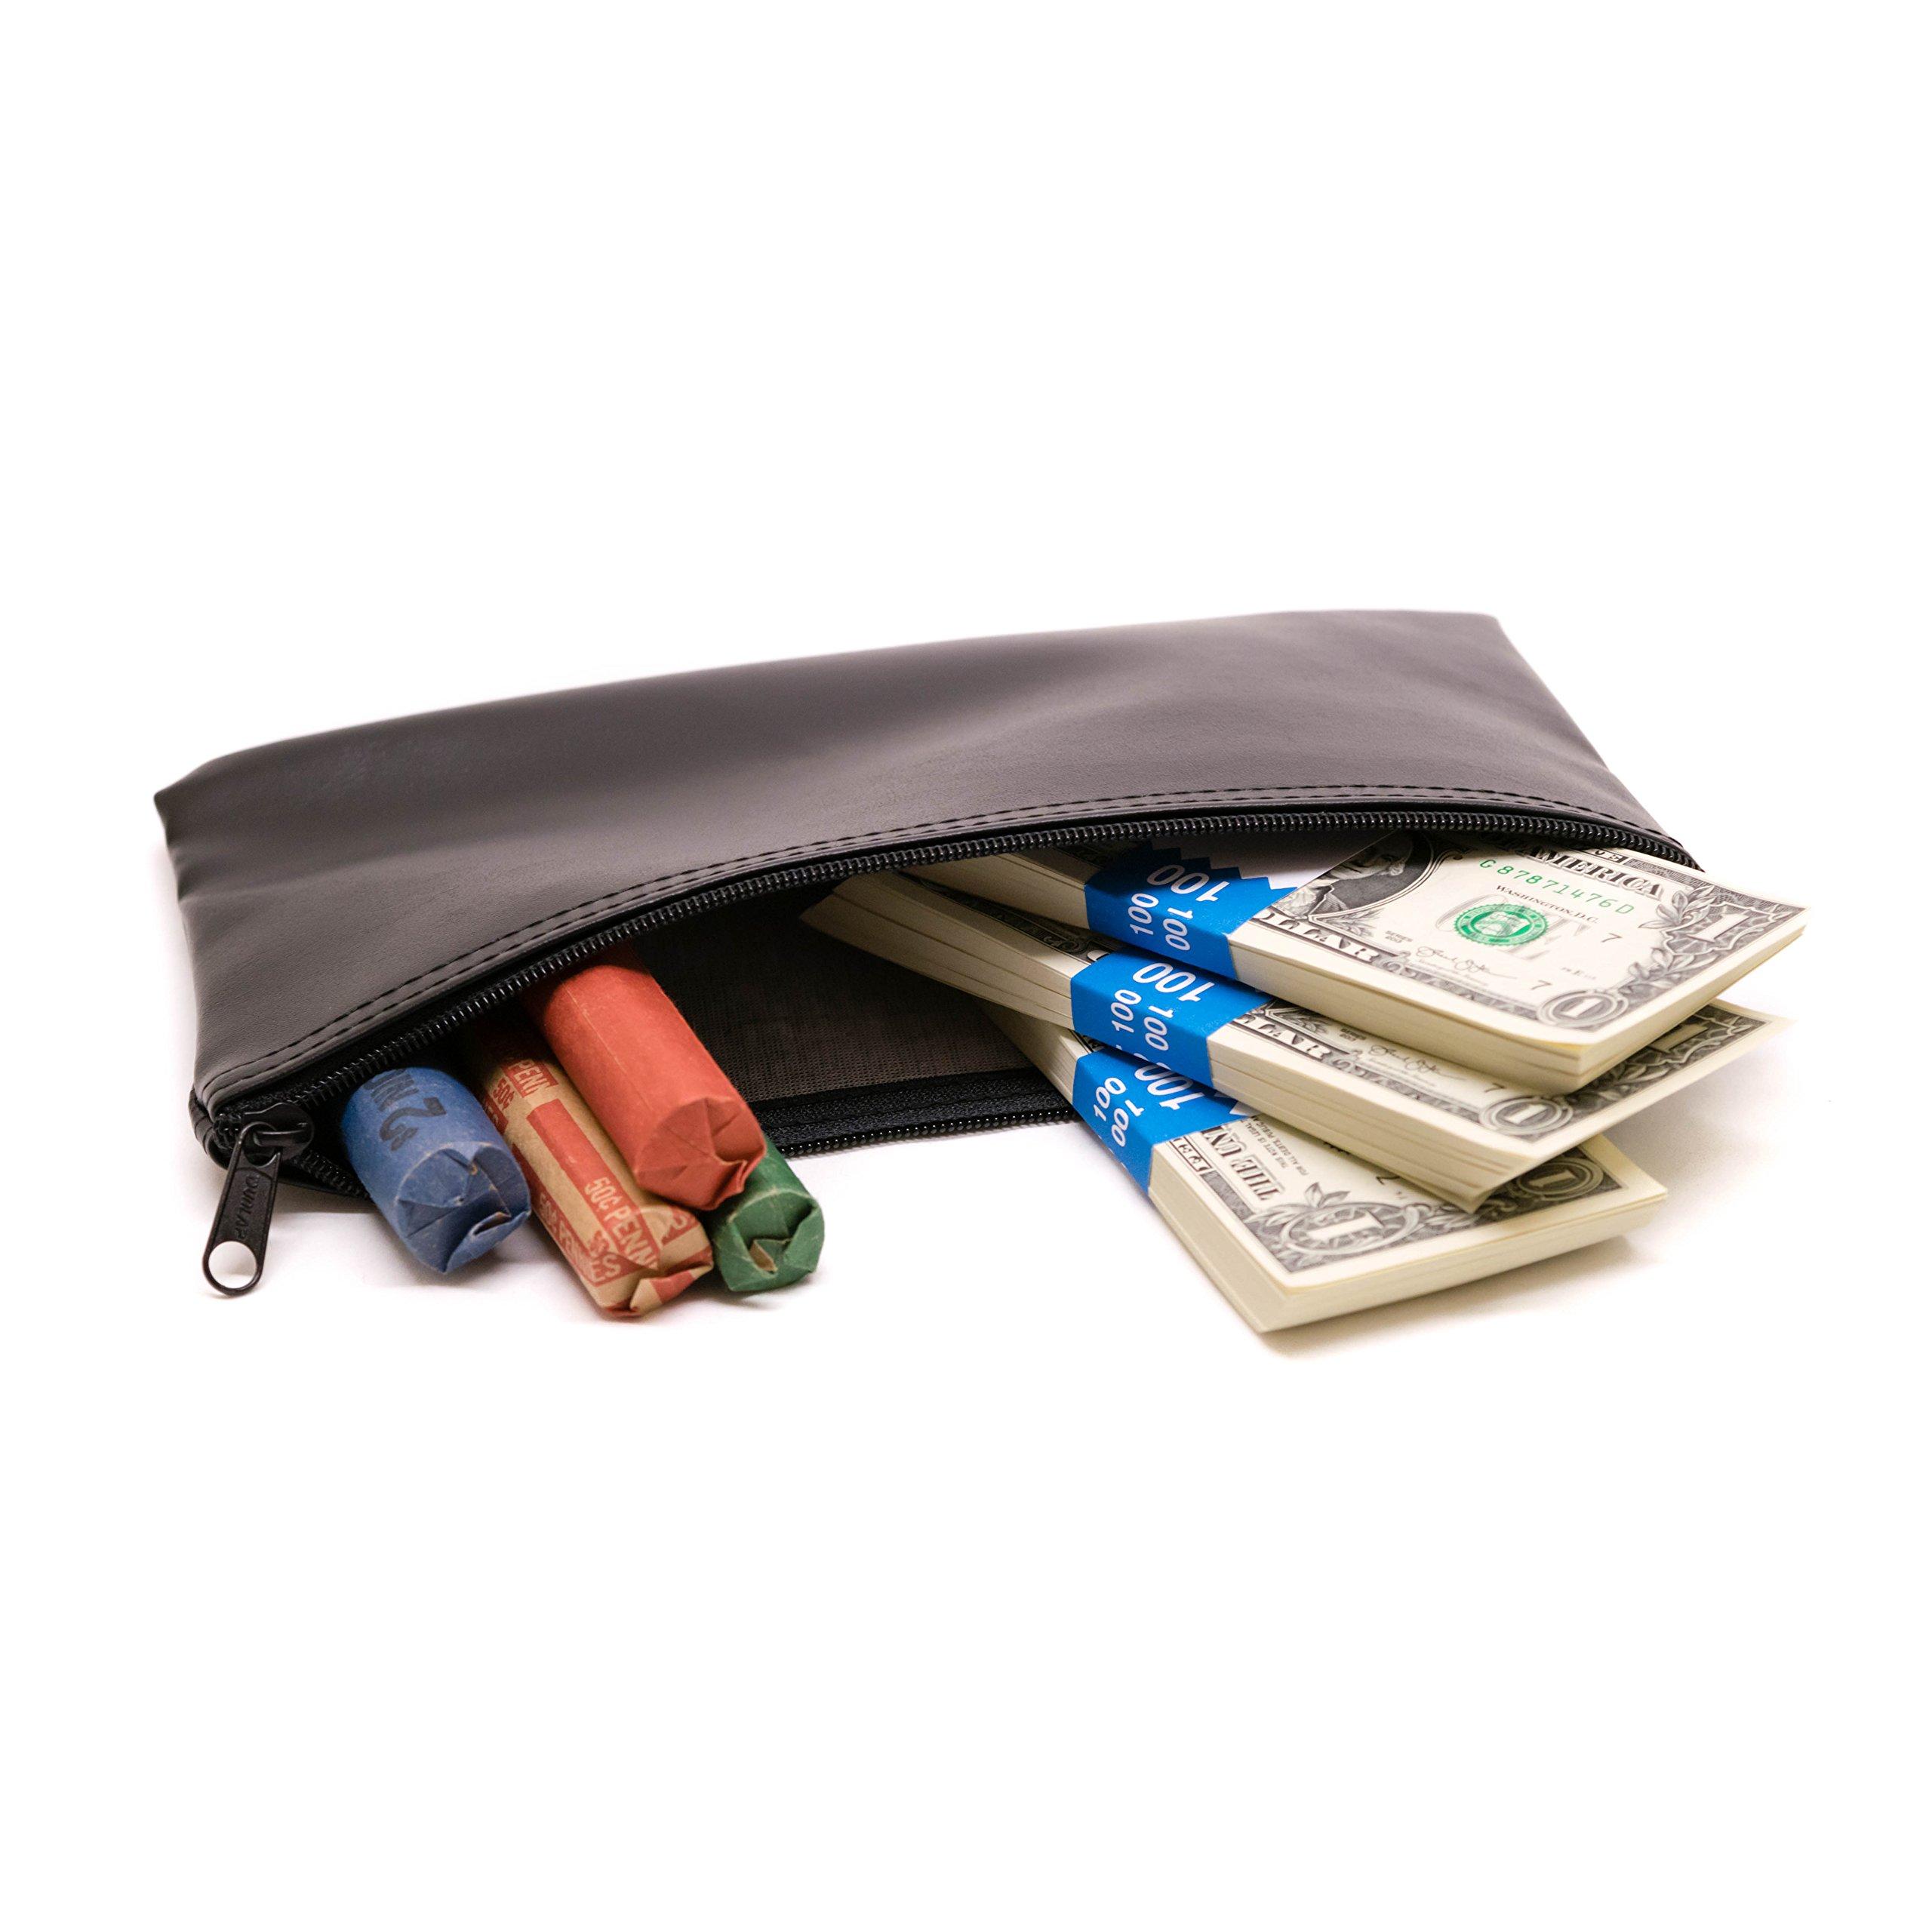 Zipper Bank Deposit Bag 5.5 X 10.5 Coin Check Money Wallet Black Pack of 5